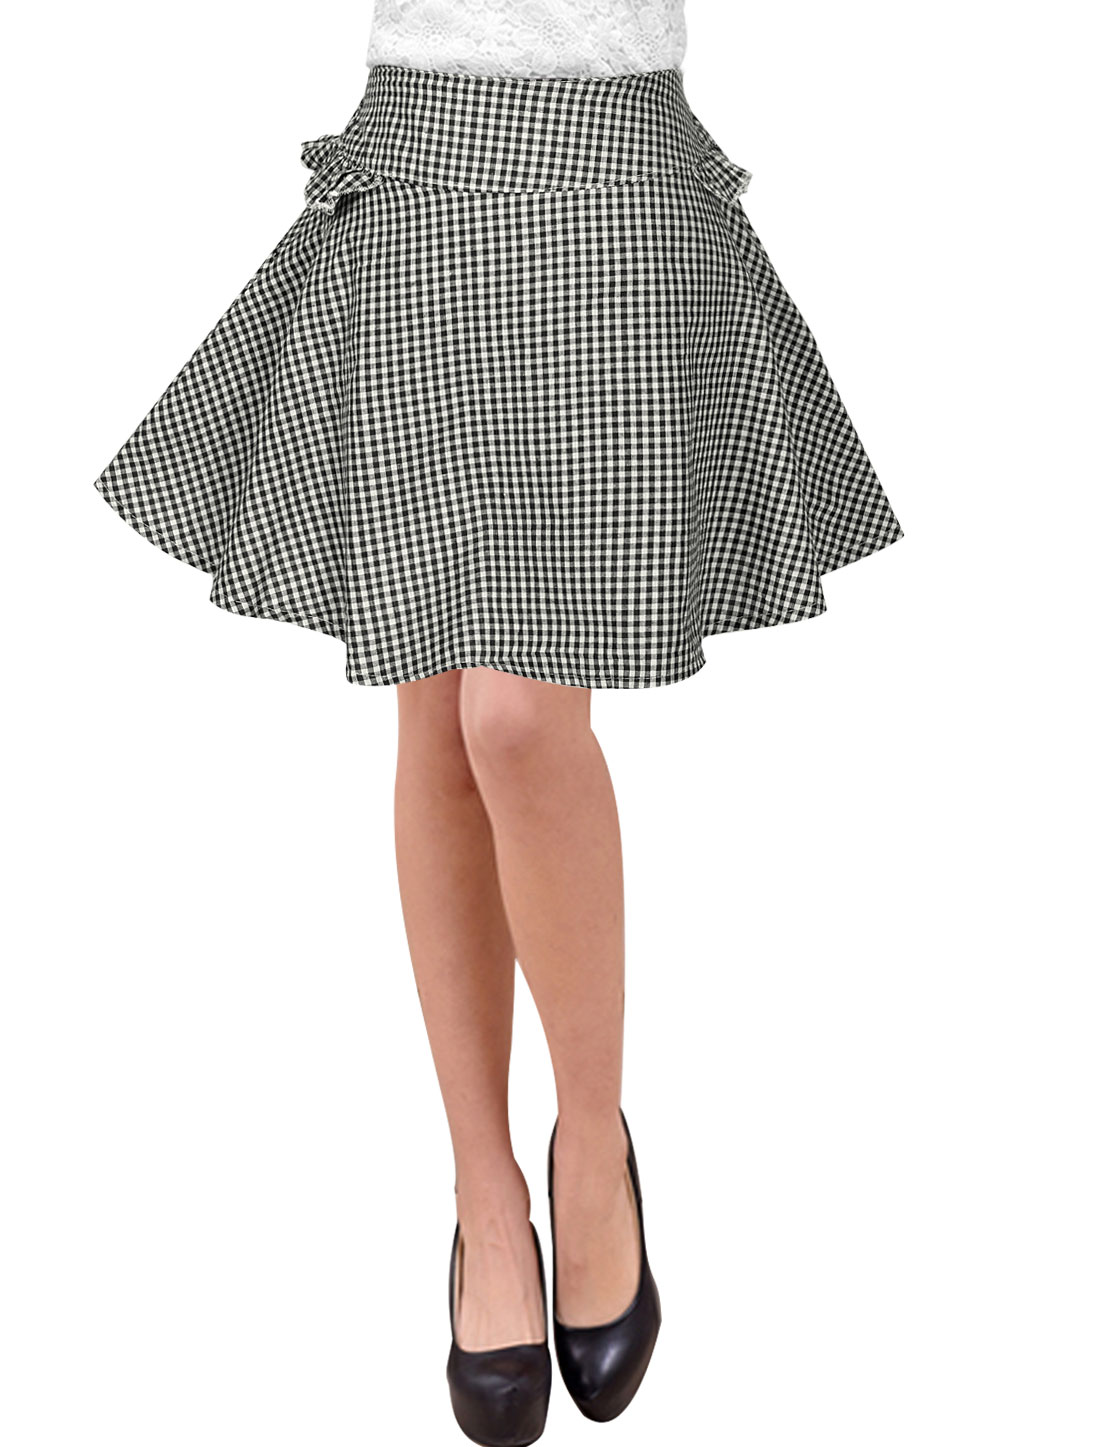 Ladies Mid Rise Elastic Waist Layered Unlined Casual Plaid Skirt Black XS